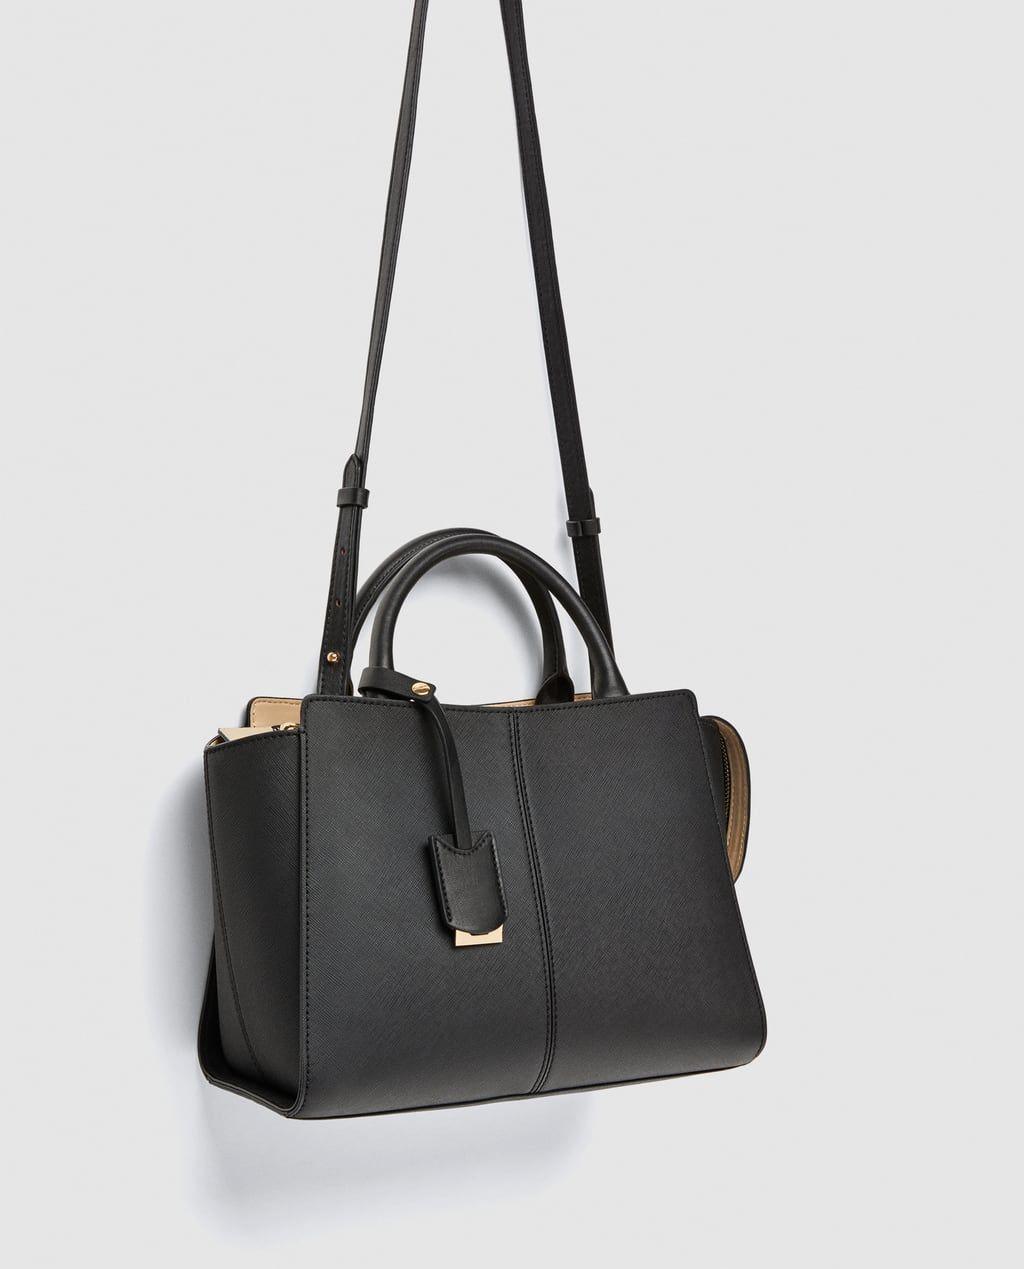 c0942068df8 MEDIUM TOTE BAG WITH CONTRASTING PENDANT DETAIL-Crossbody bags-BAGS-WOMAN |  ZARA United States